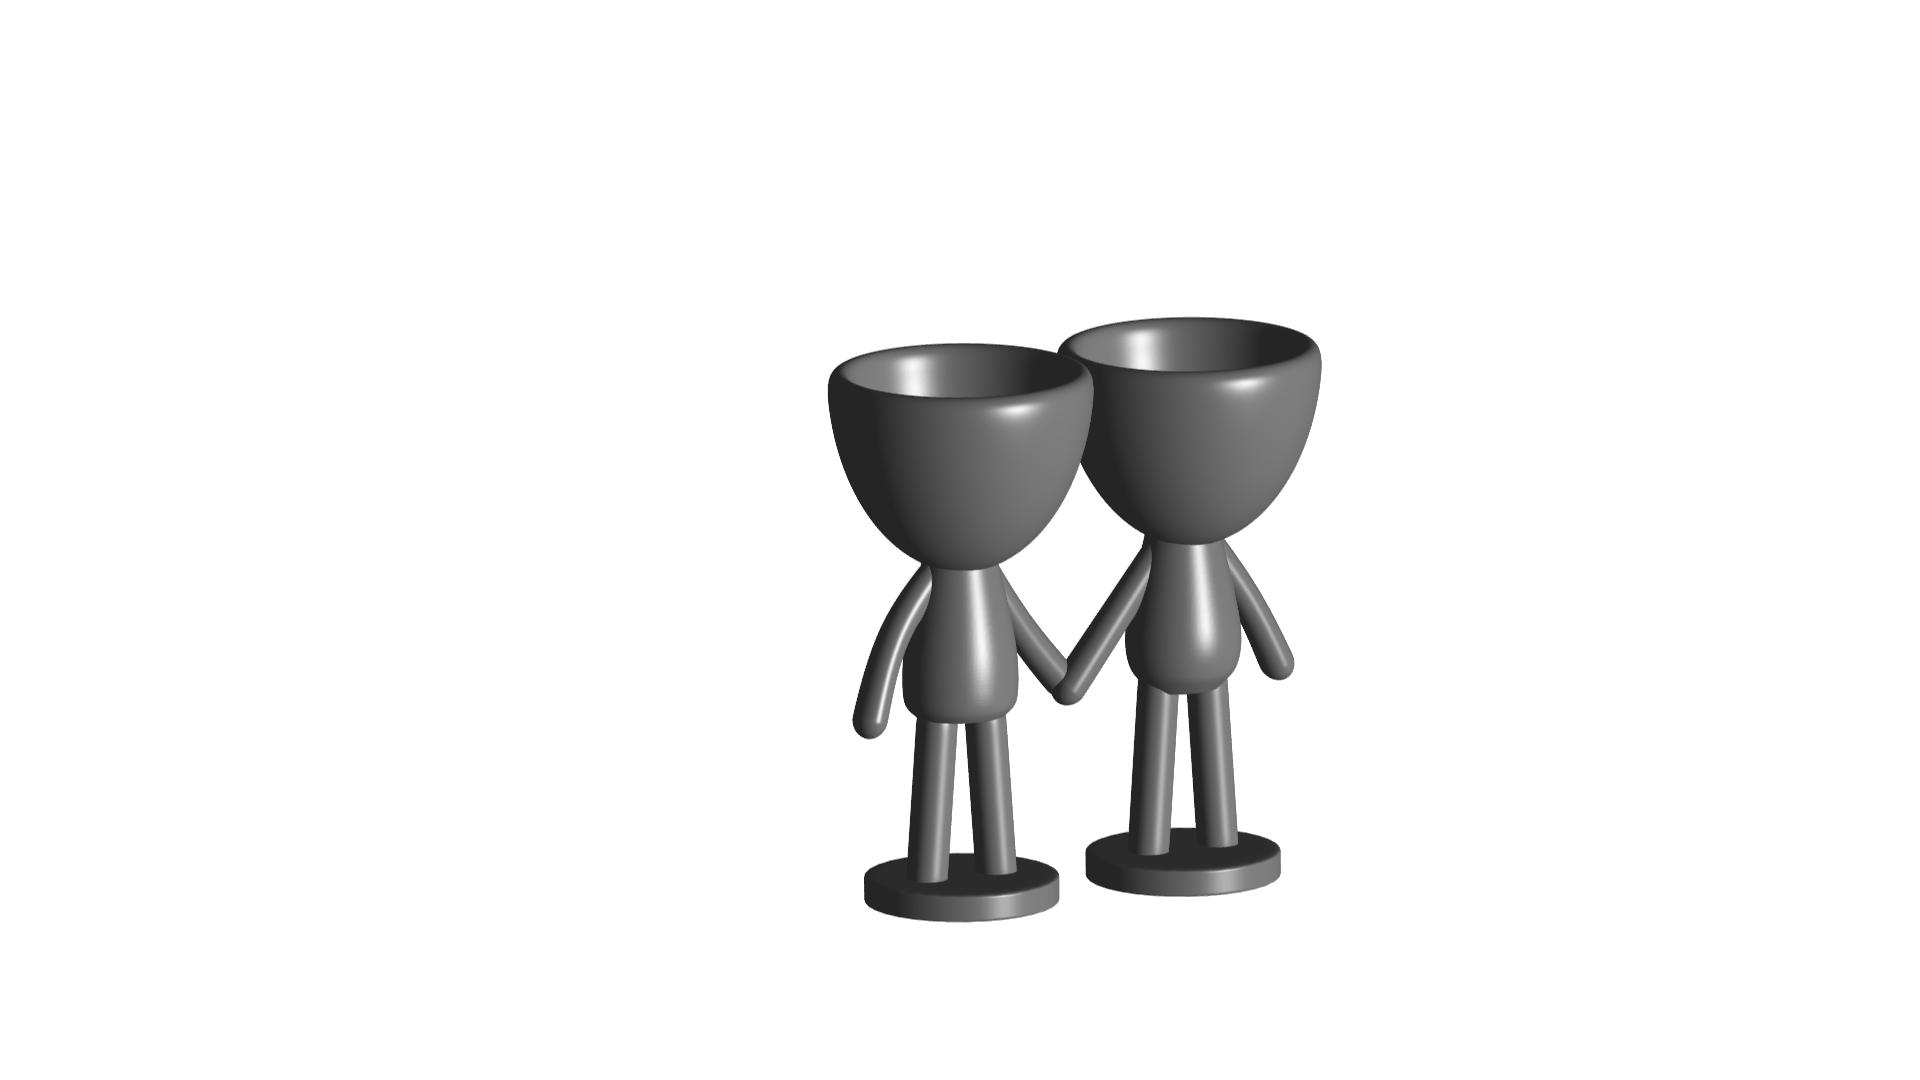 Enamorados_N6_Gris_1.png Télécharger fichier STL gratuit N° 6 VASES ROBERT IN LOVE - N° 6 VASE 8 POT DE FLEURS ROBERT IN LOVE • Design pour imprimante 3D, CREATIONSISHI